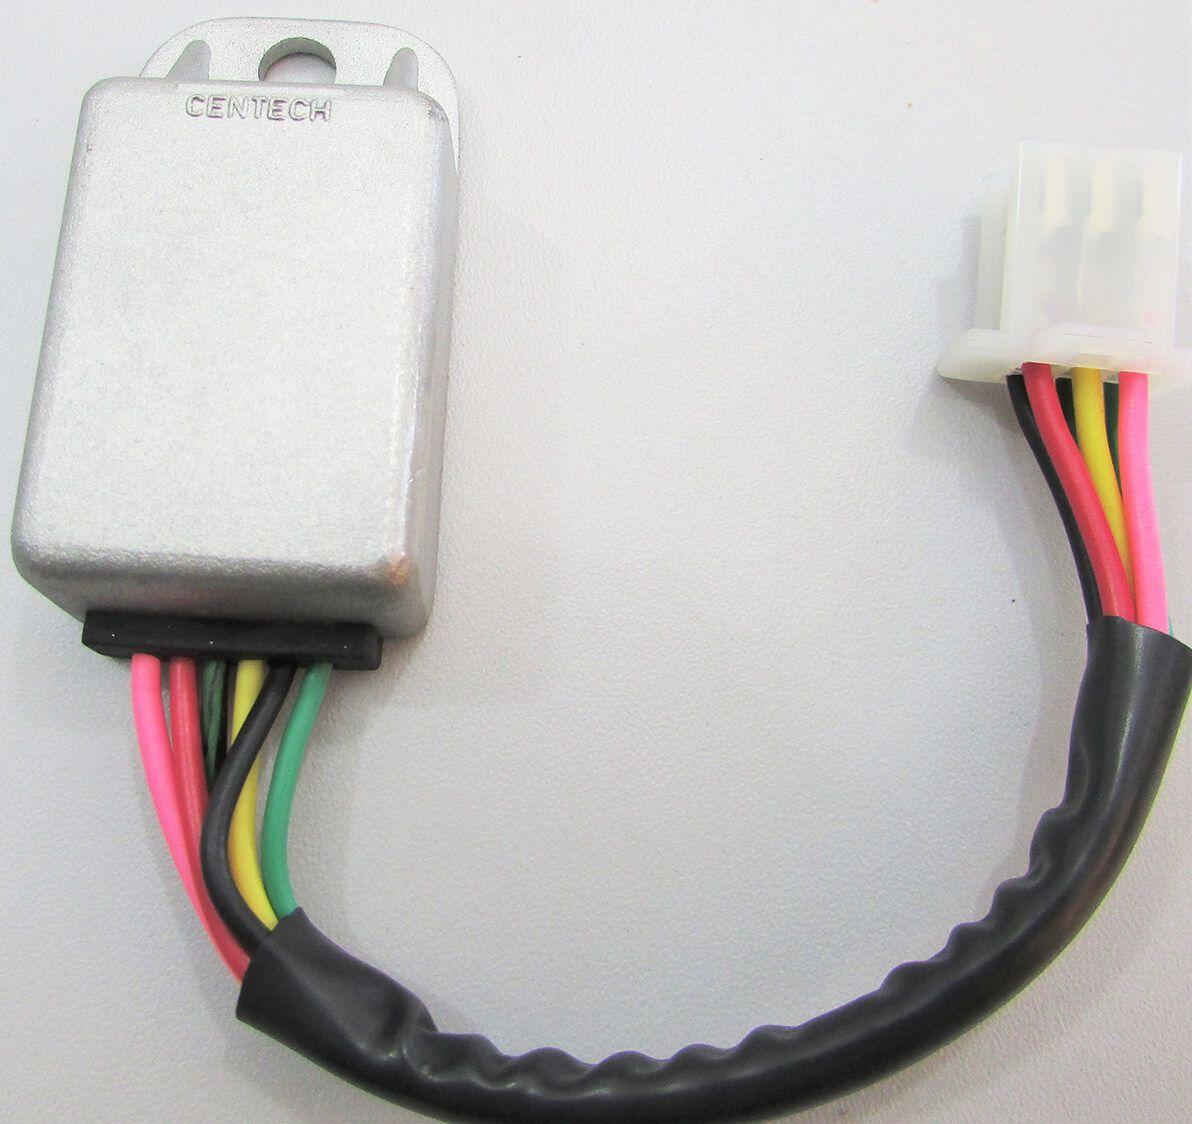 Regulador Retificador Honda Turuna (1983+) / ML (1985+) / XL 125 S (6 fios)